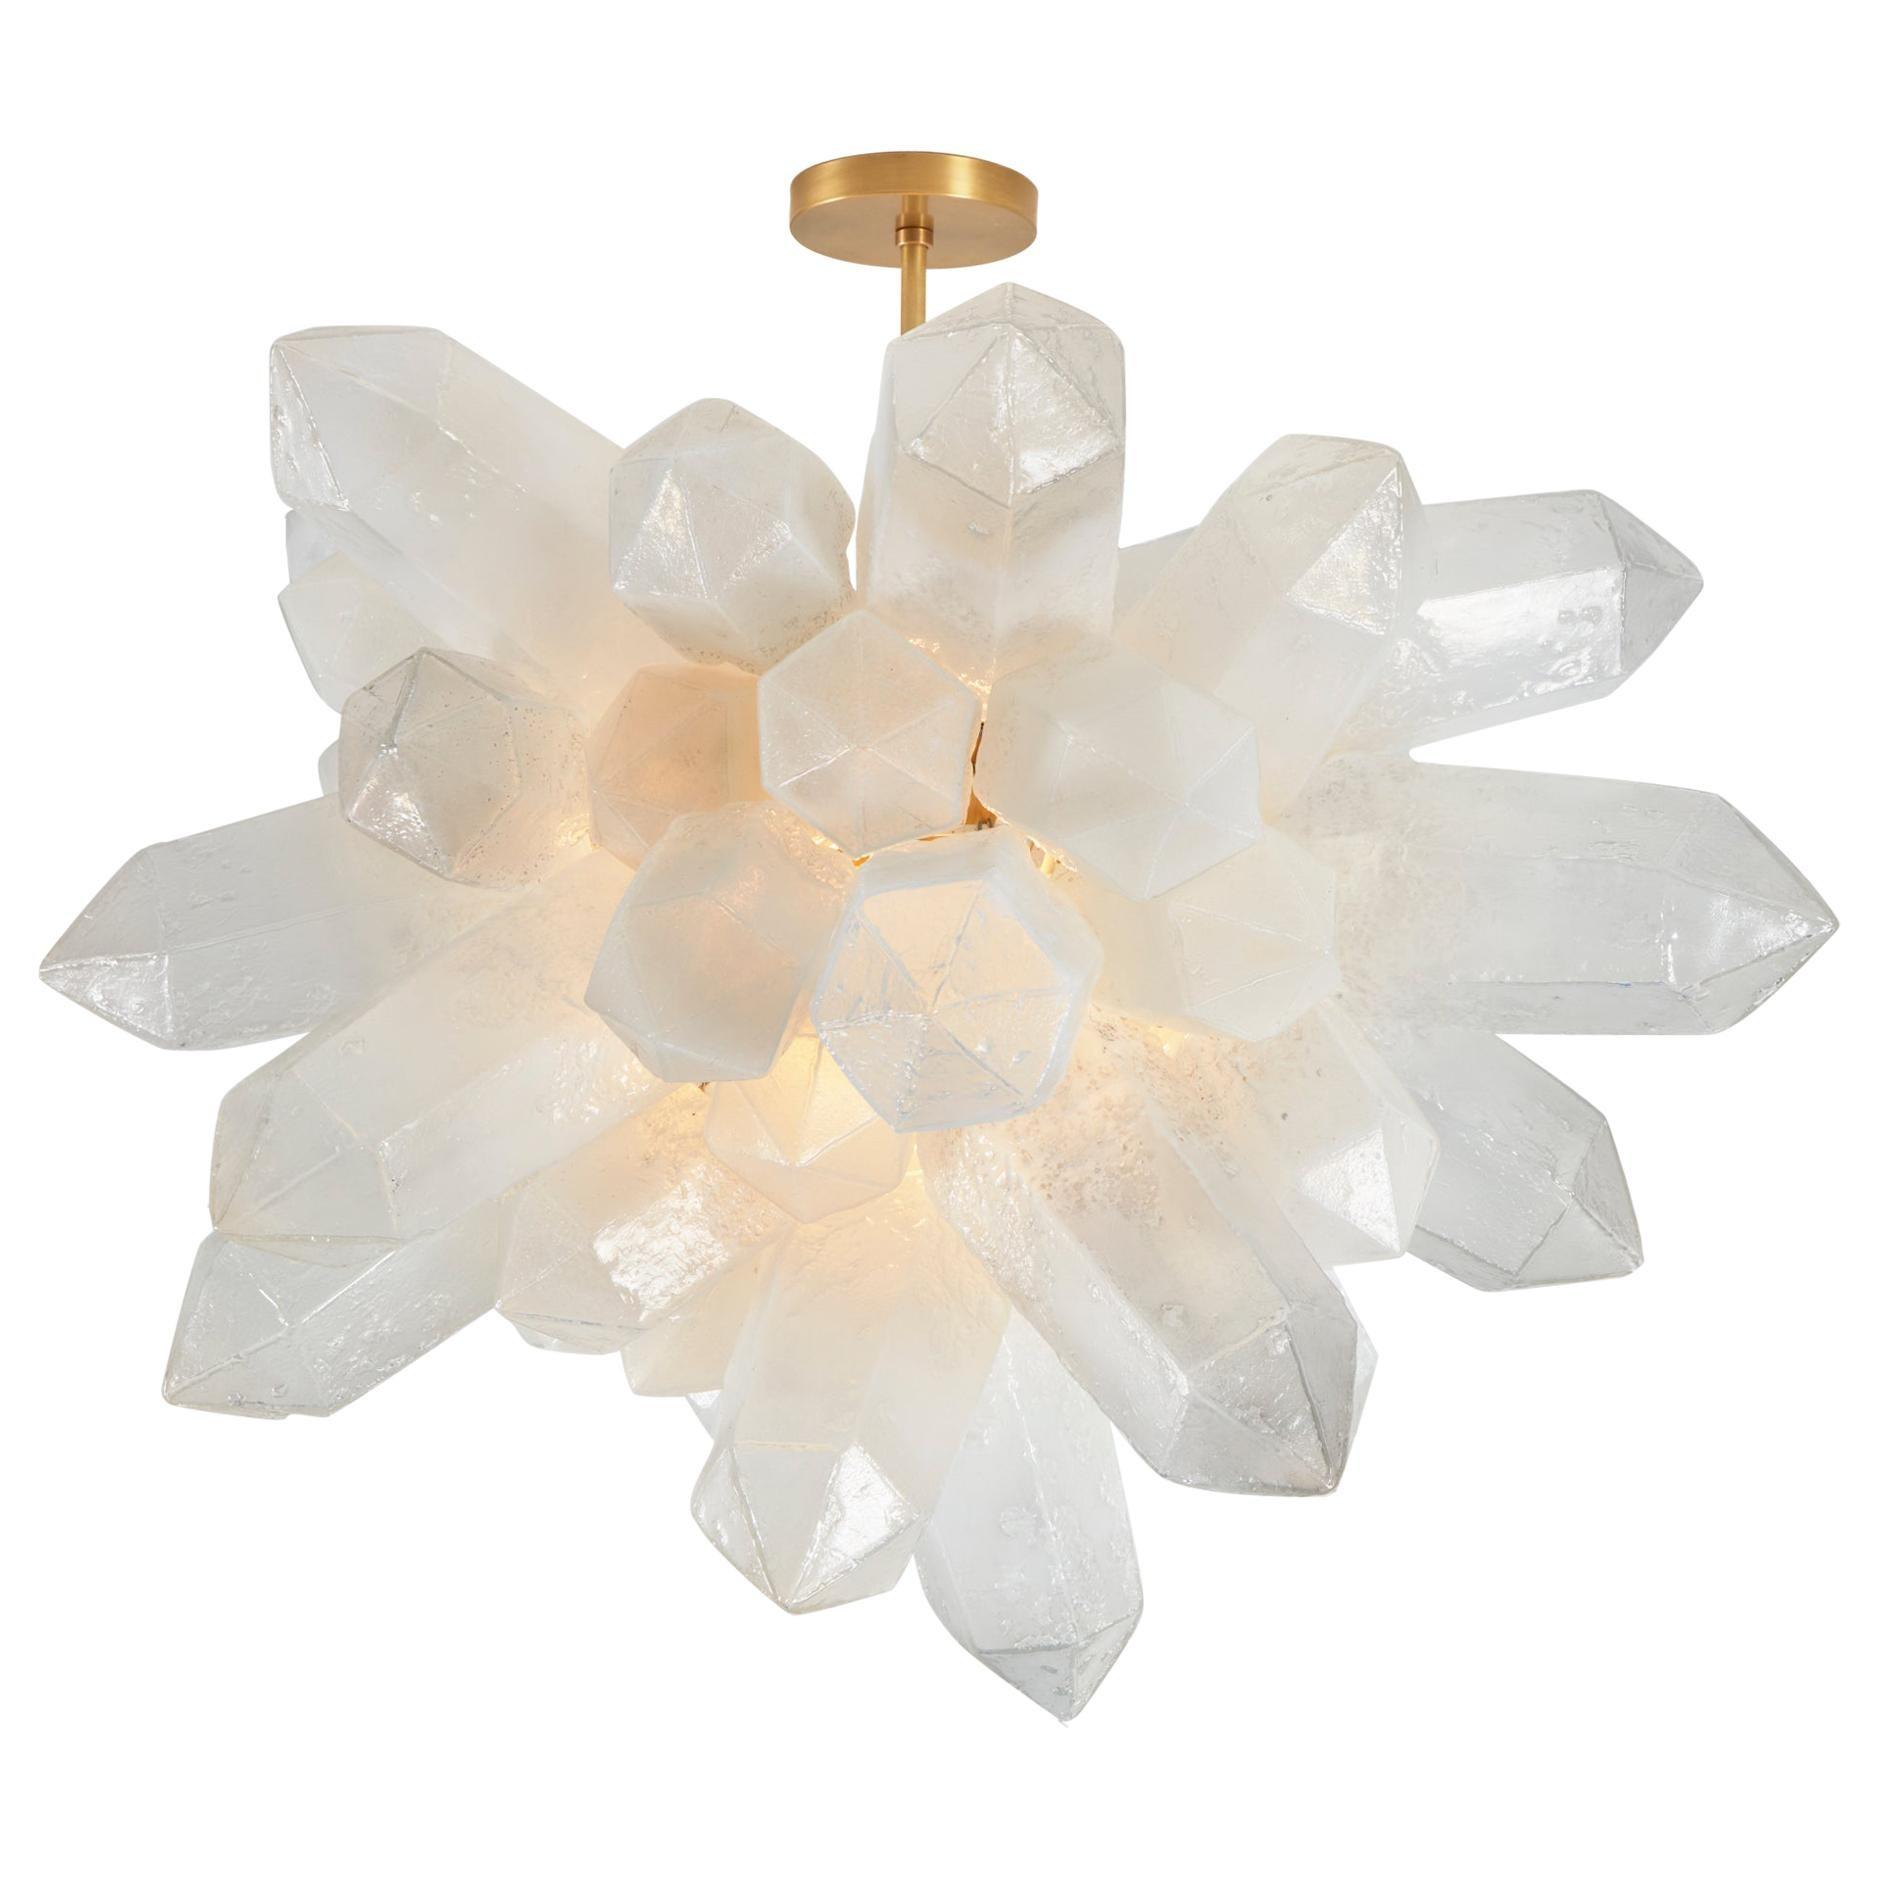 Crystal Cluster Designed by Jeff Zimmerman